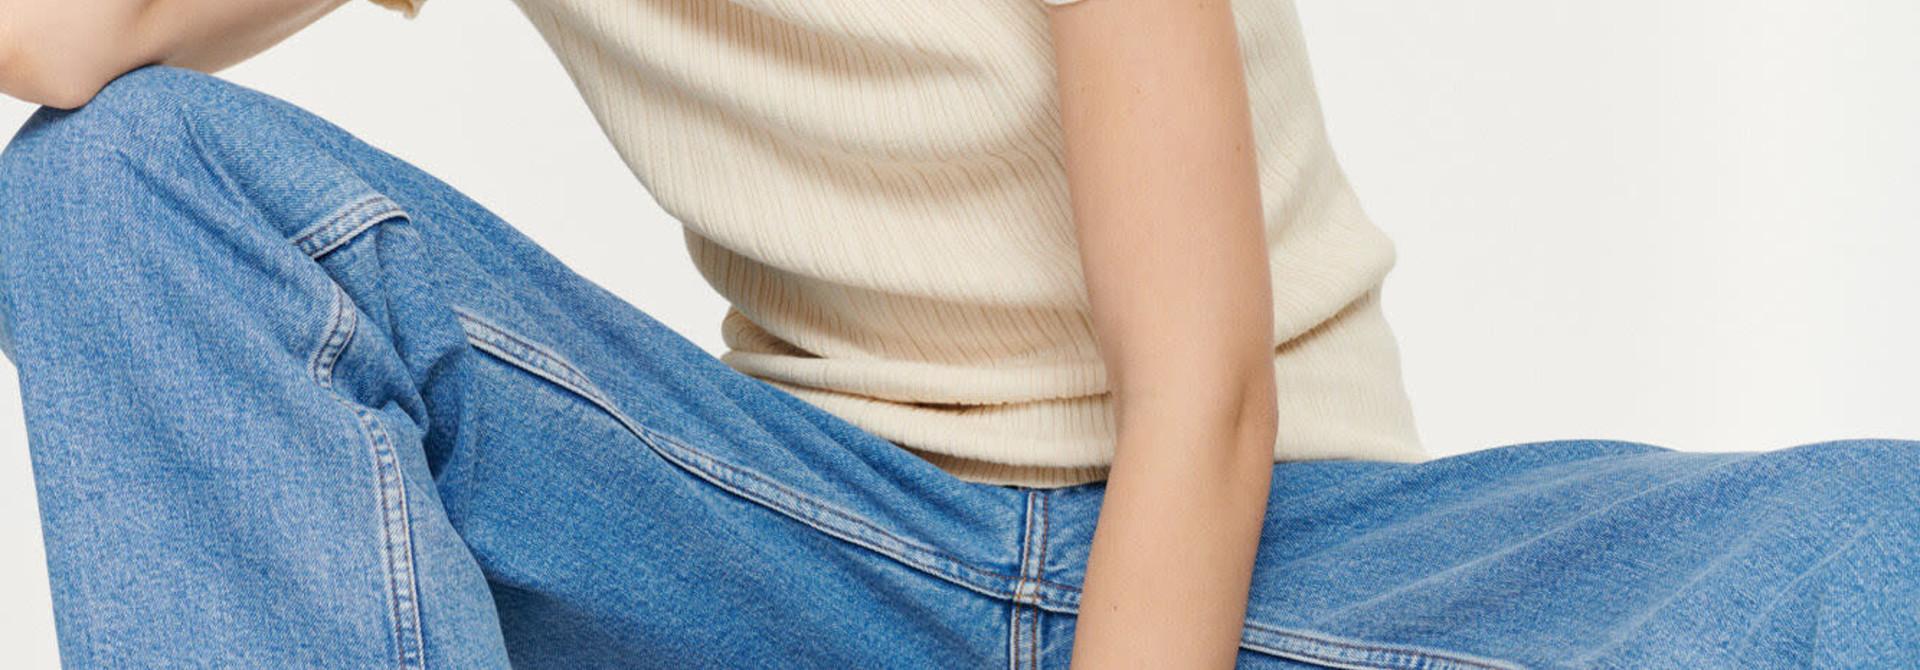 Riley jeans samsoe samsoe